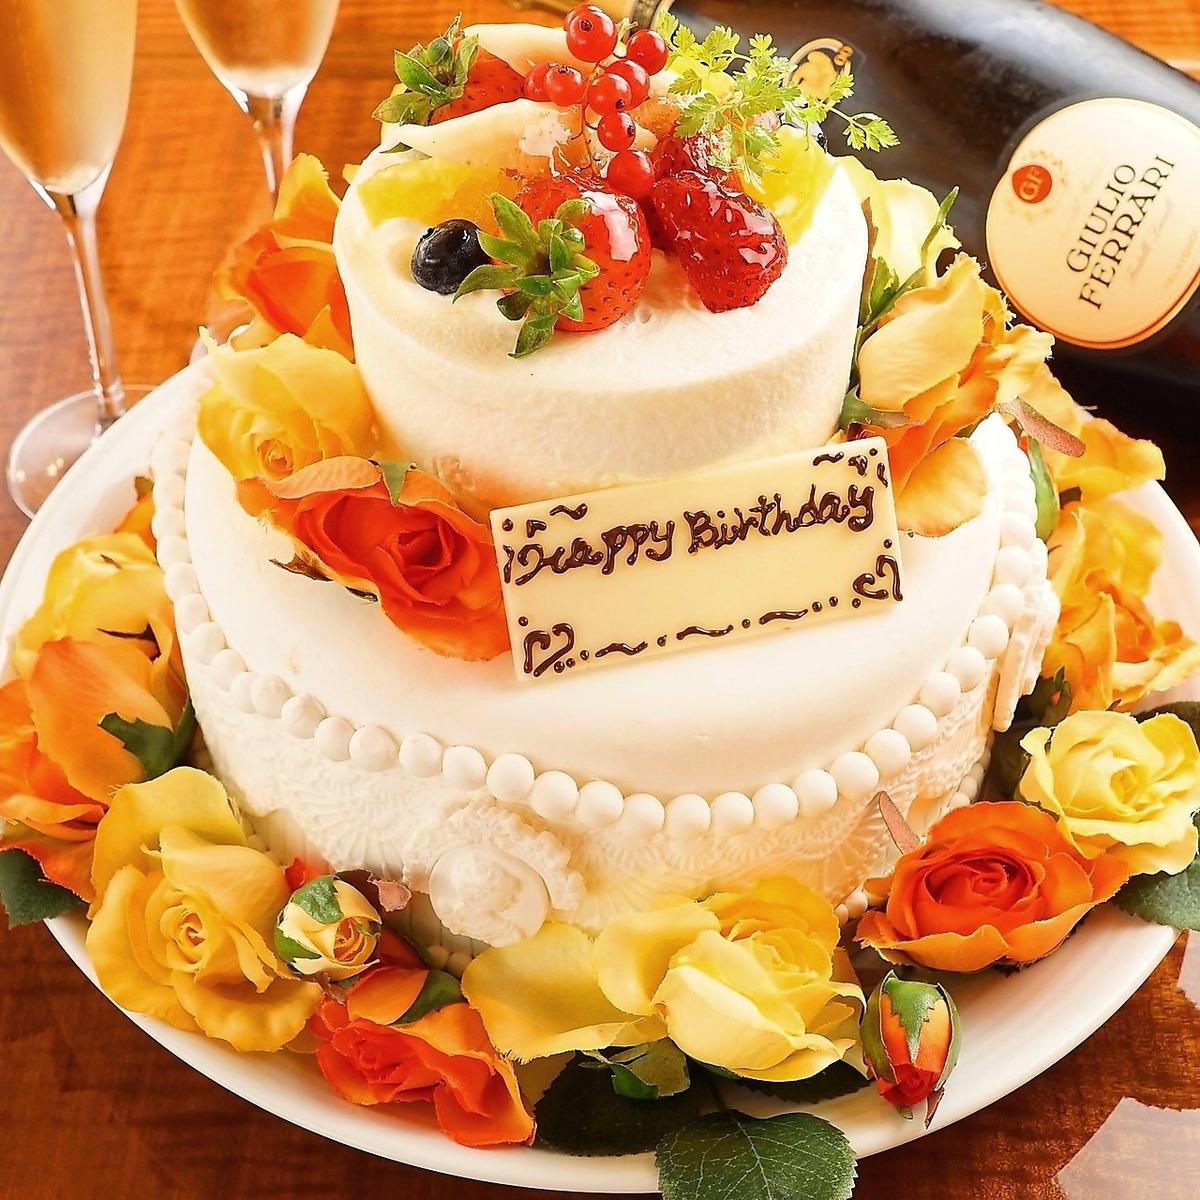 Messaged luxury cake